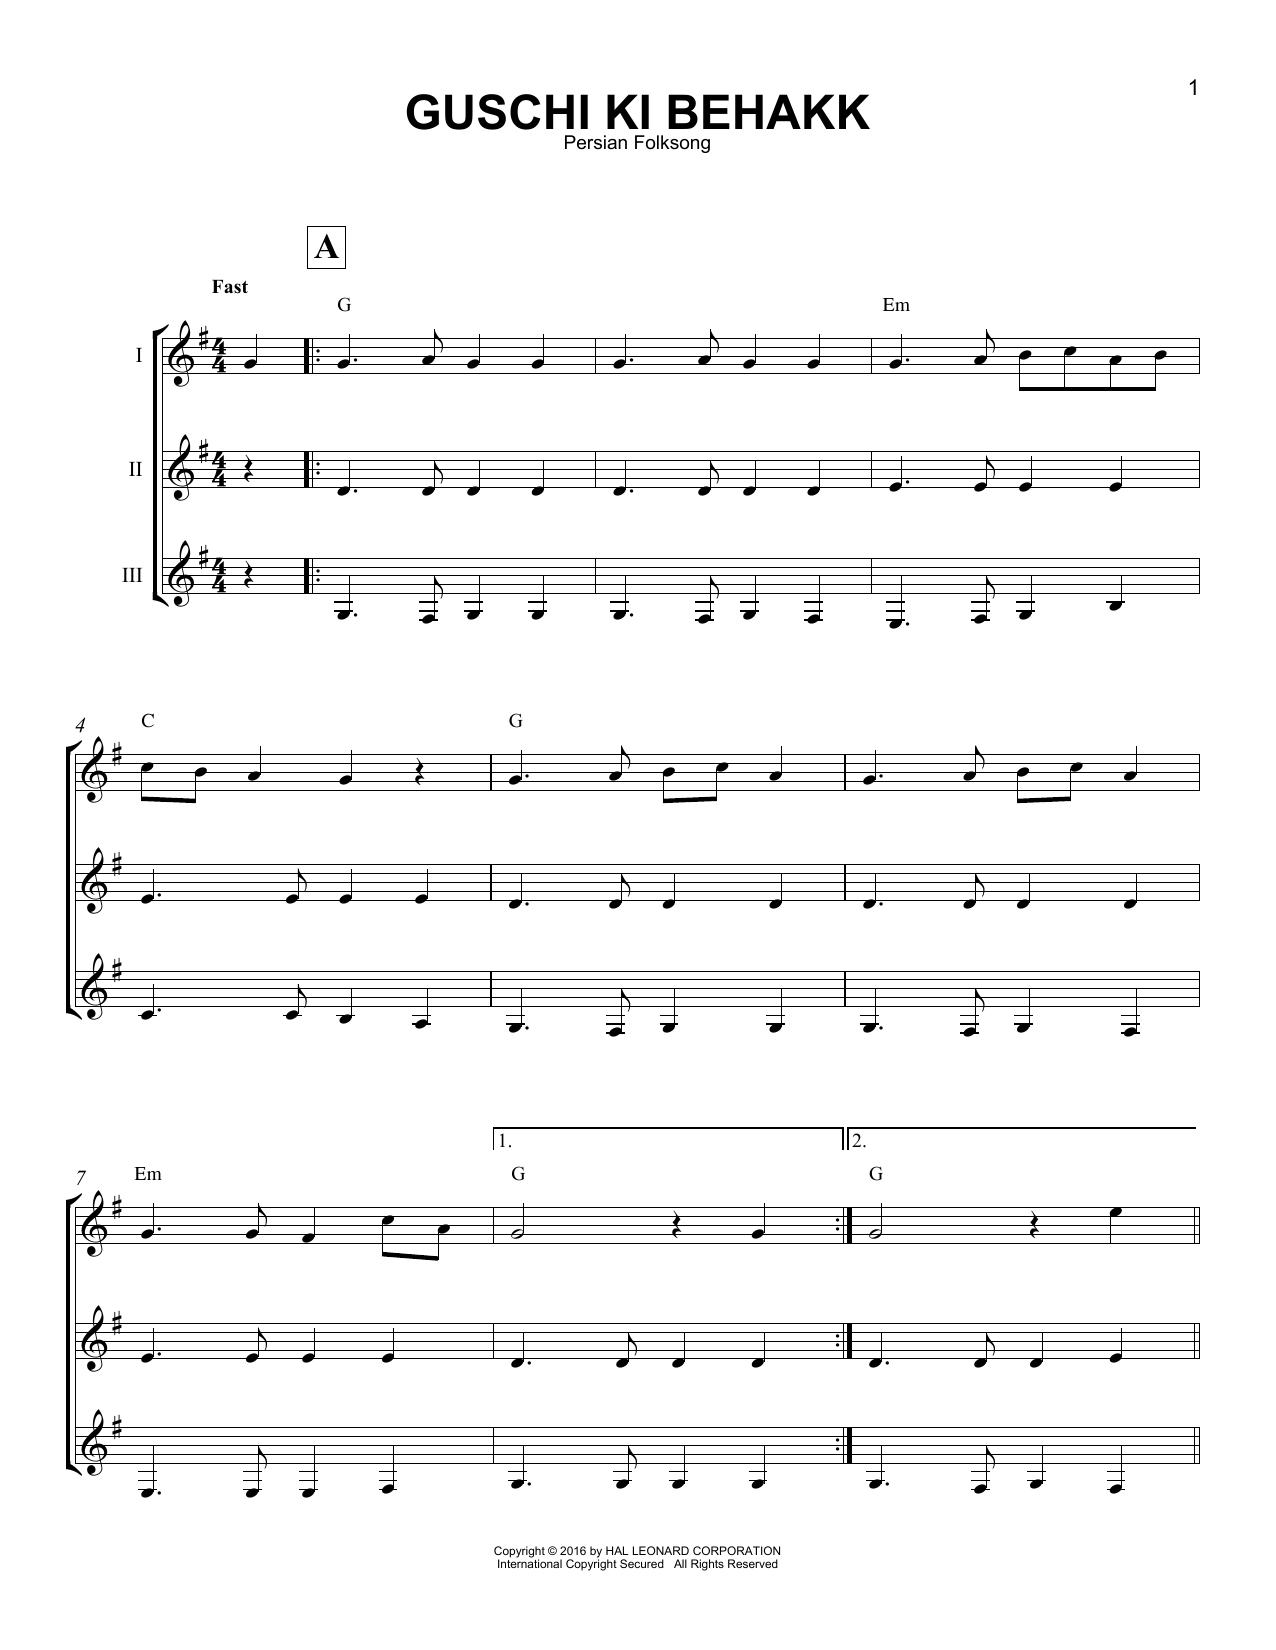 Guschi Ki Behakk Sheet Music